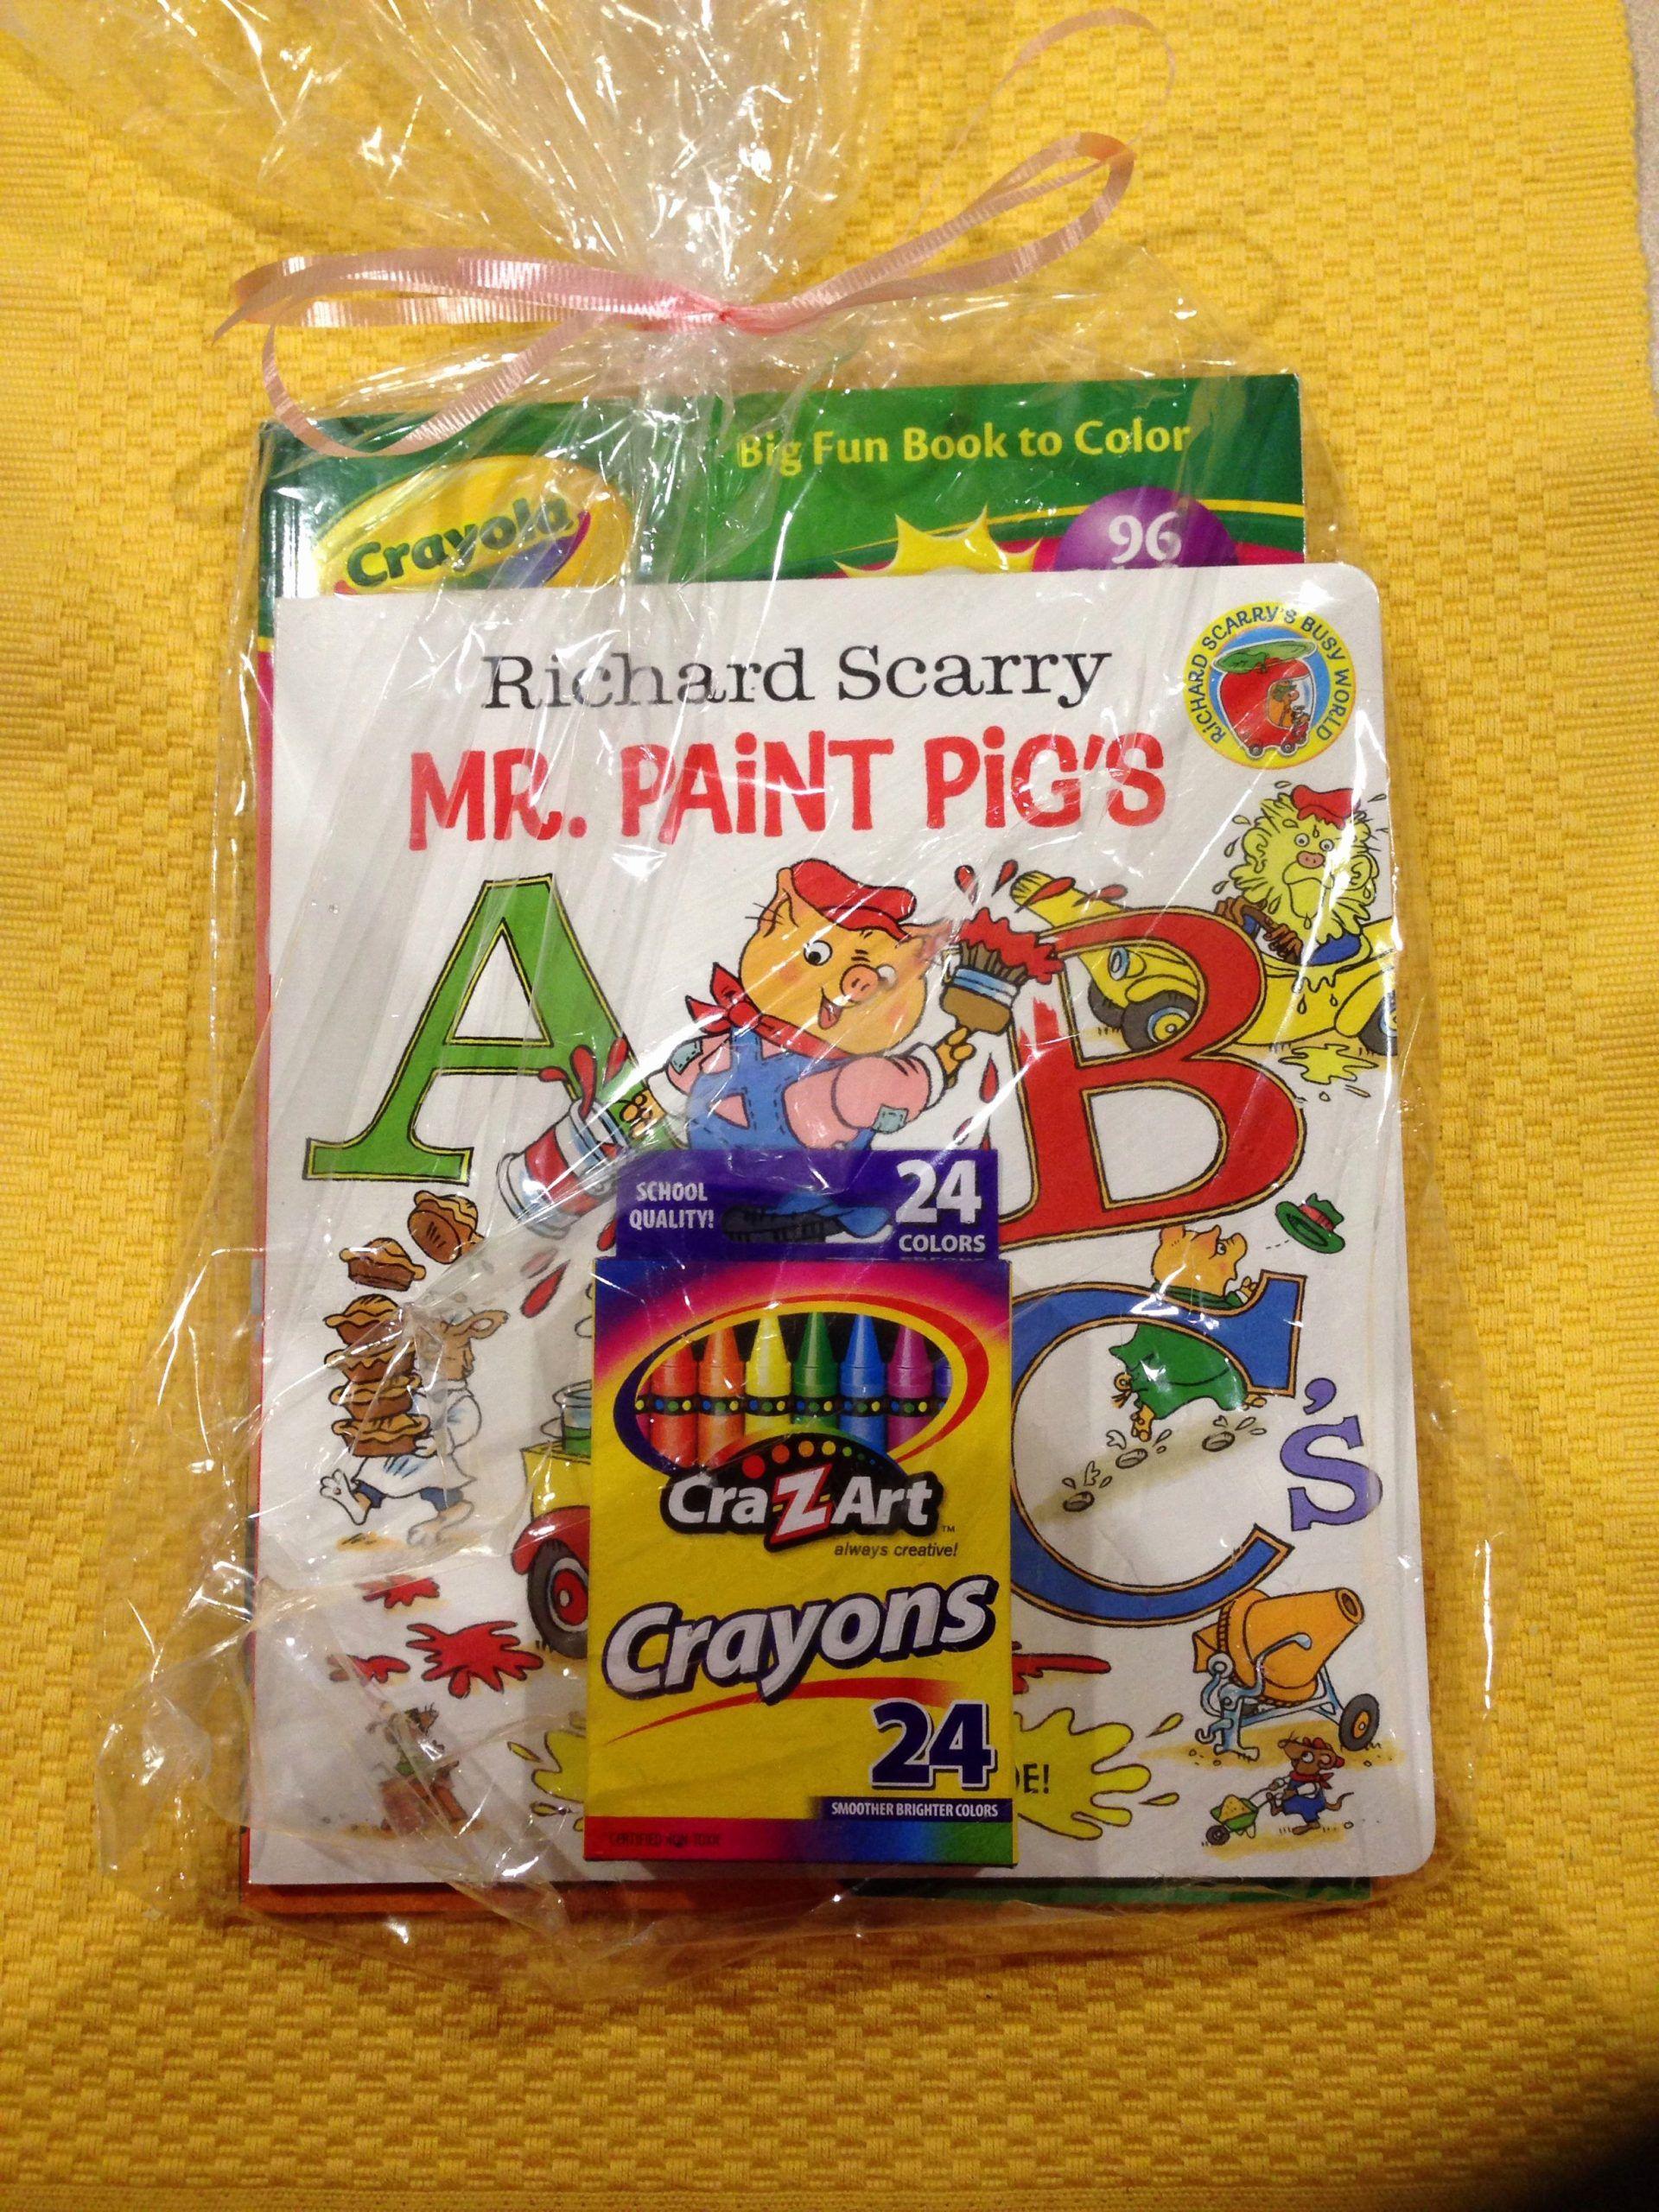 Coloring Book Party Favors Elegant Kids Party Favor Abc S Book Coloring Book And Crayons In 2020 Book Party Coloring Books Kid Party Favors